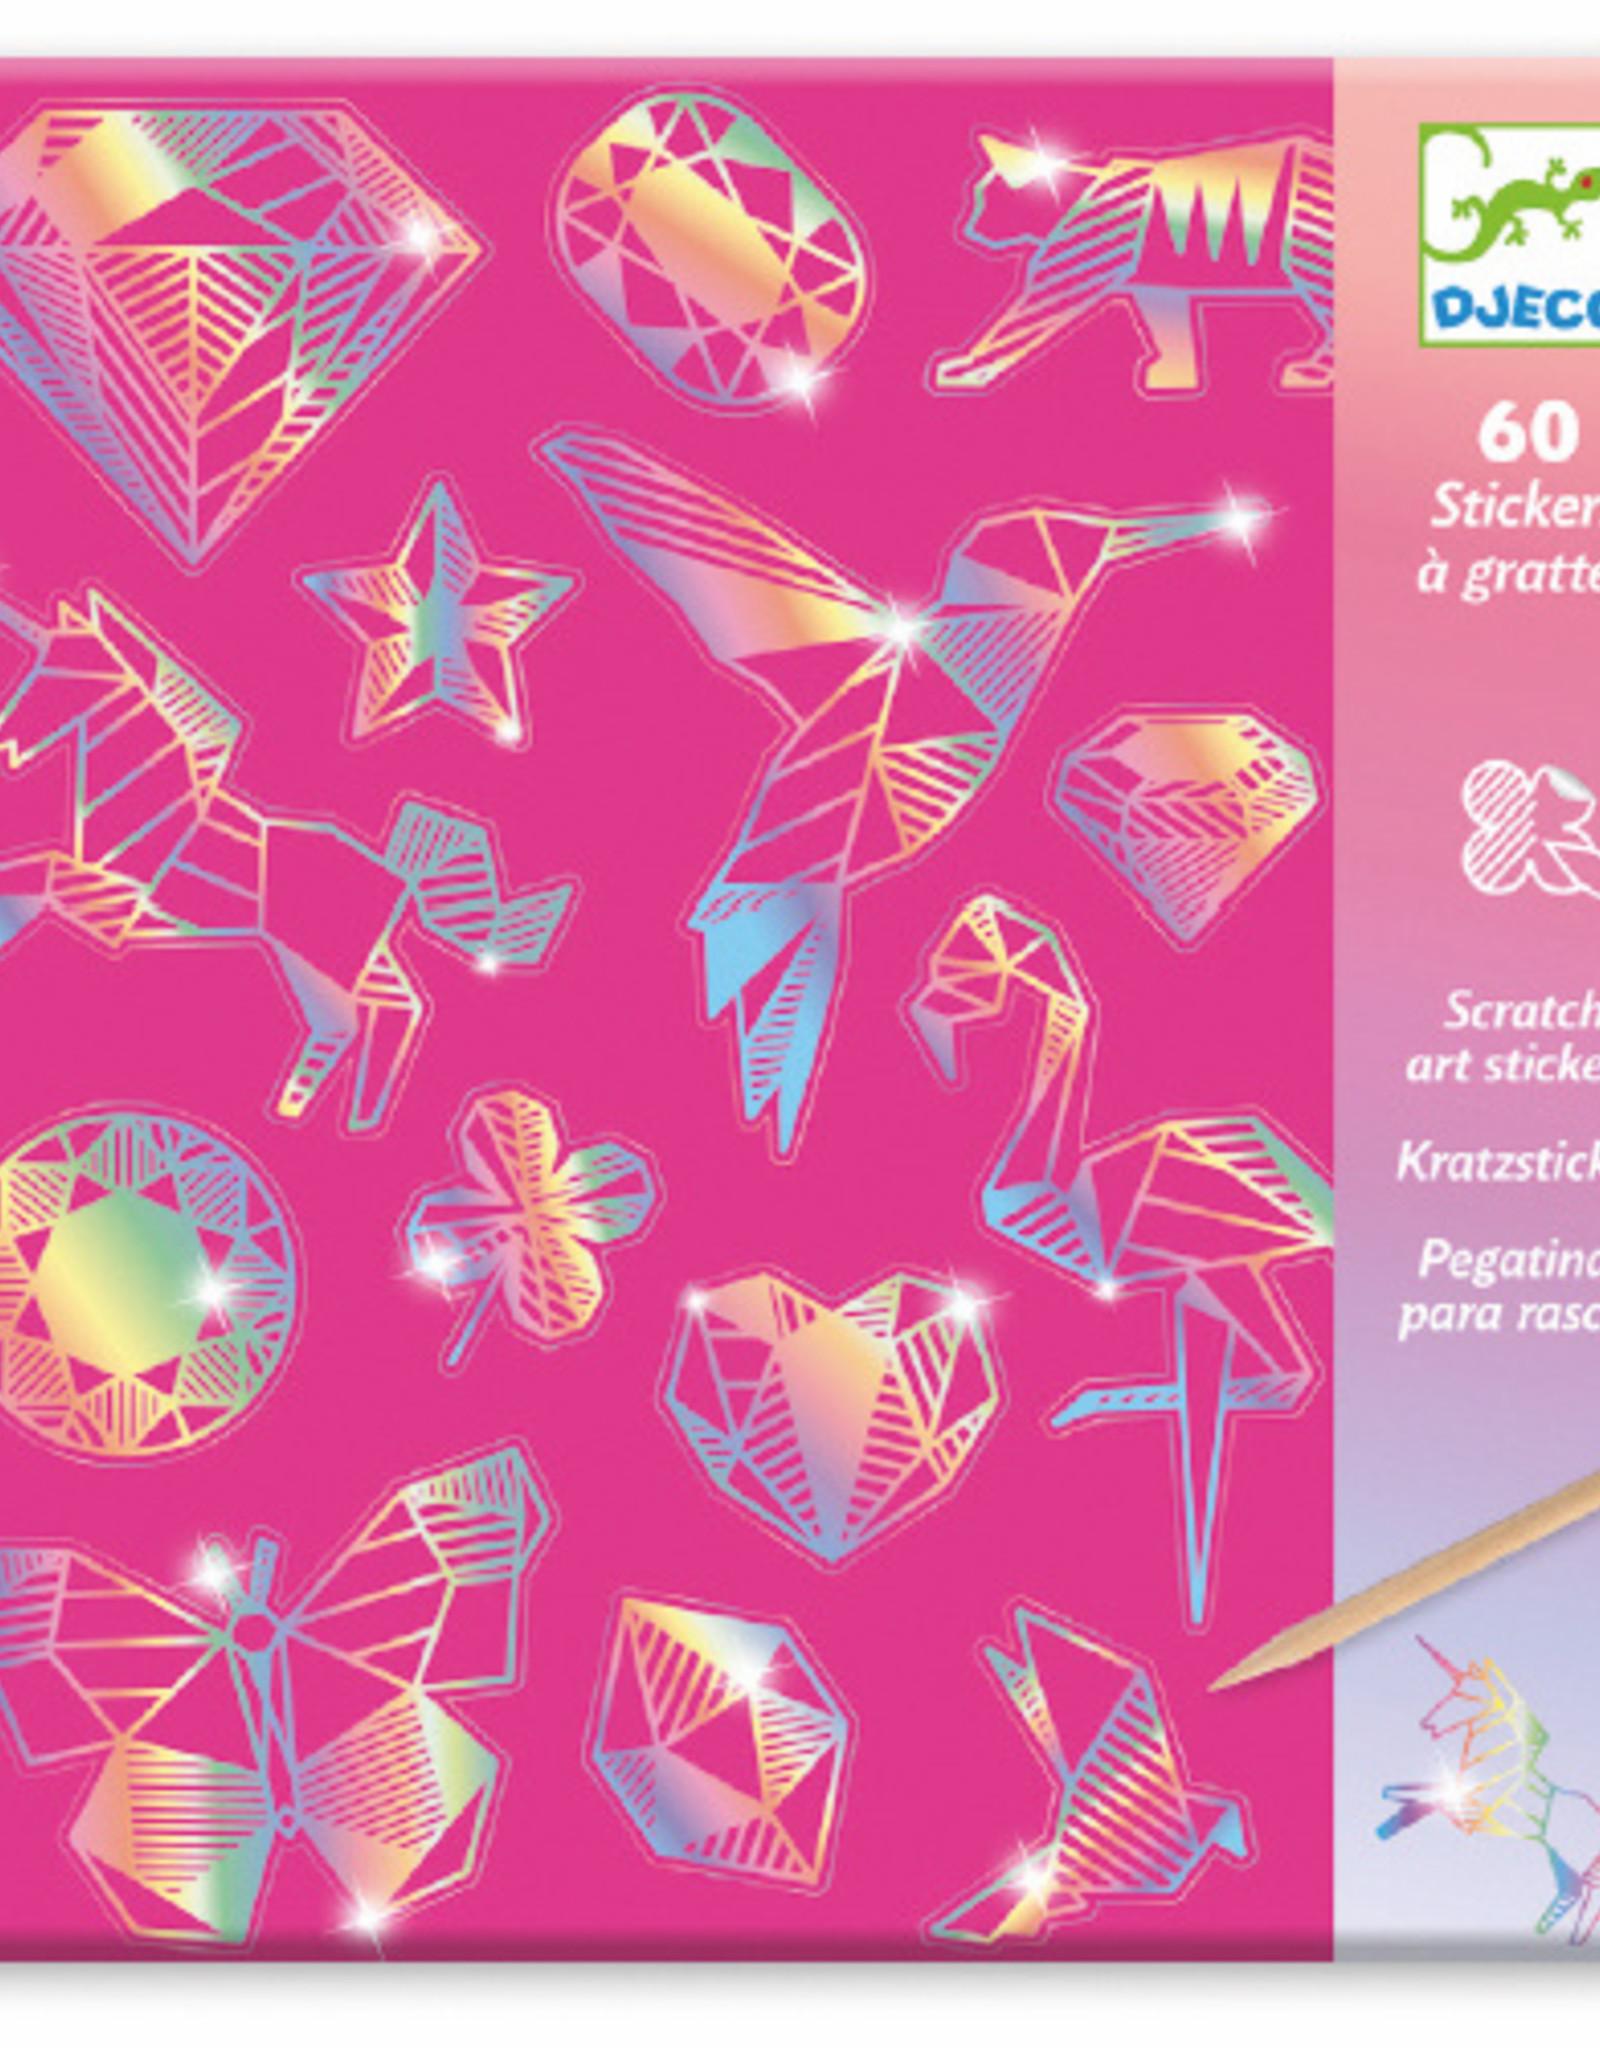 PG Scratch Stickers Diamond